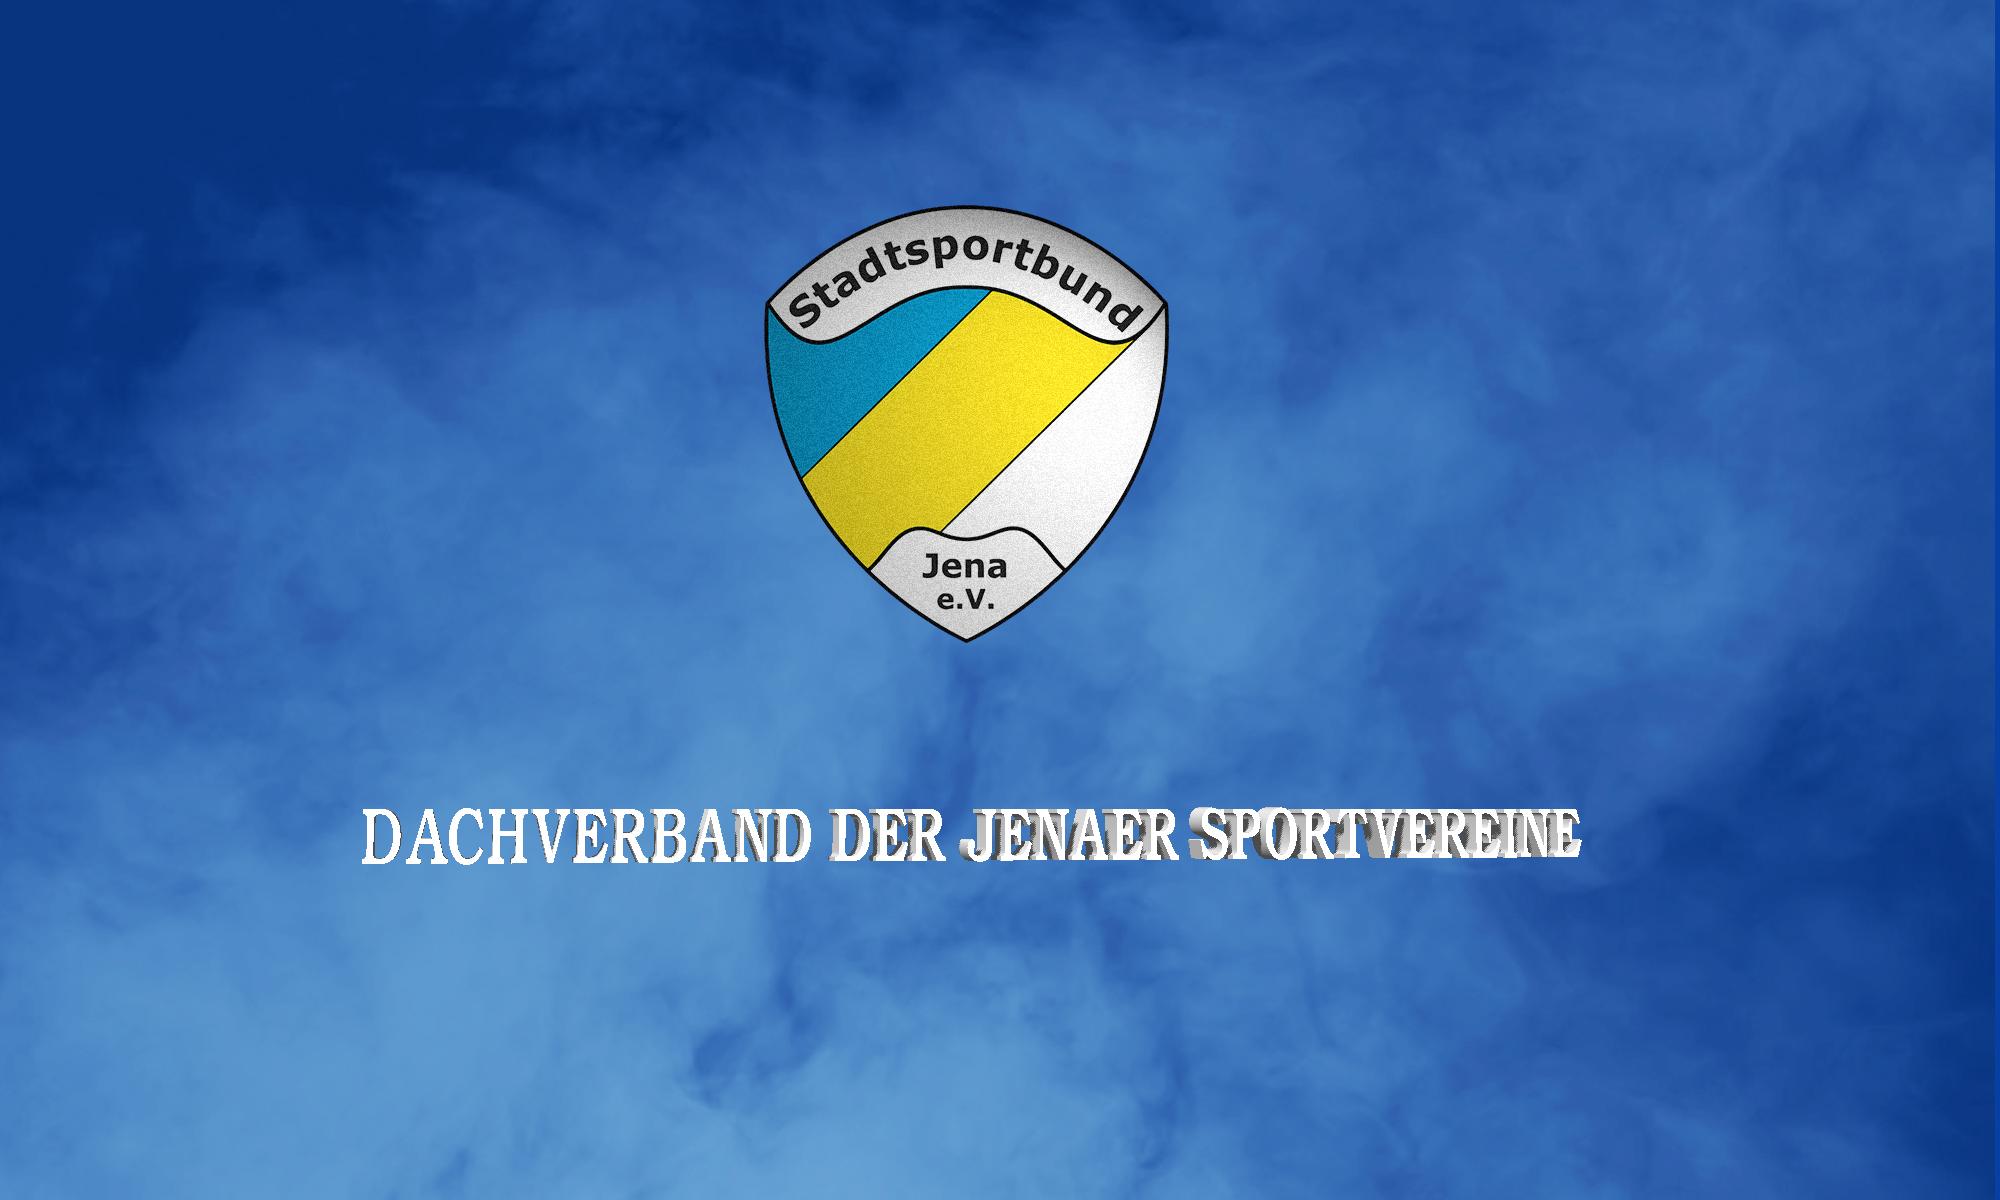 Stadtsportbund Jena e.V.